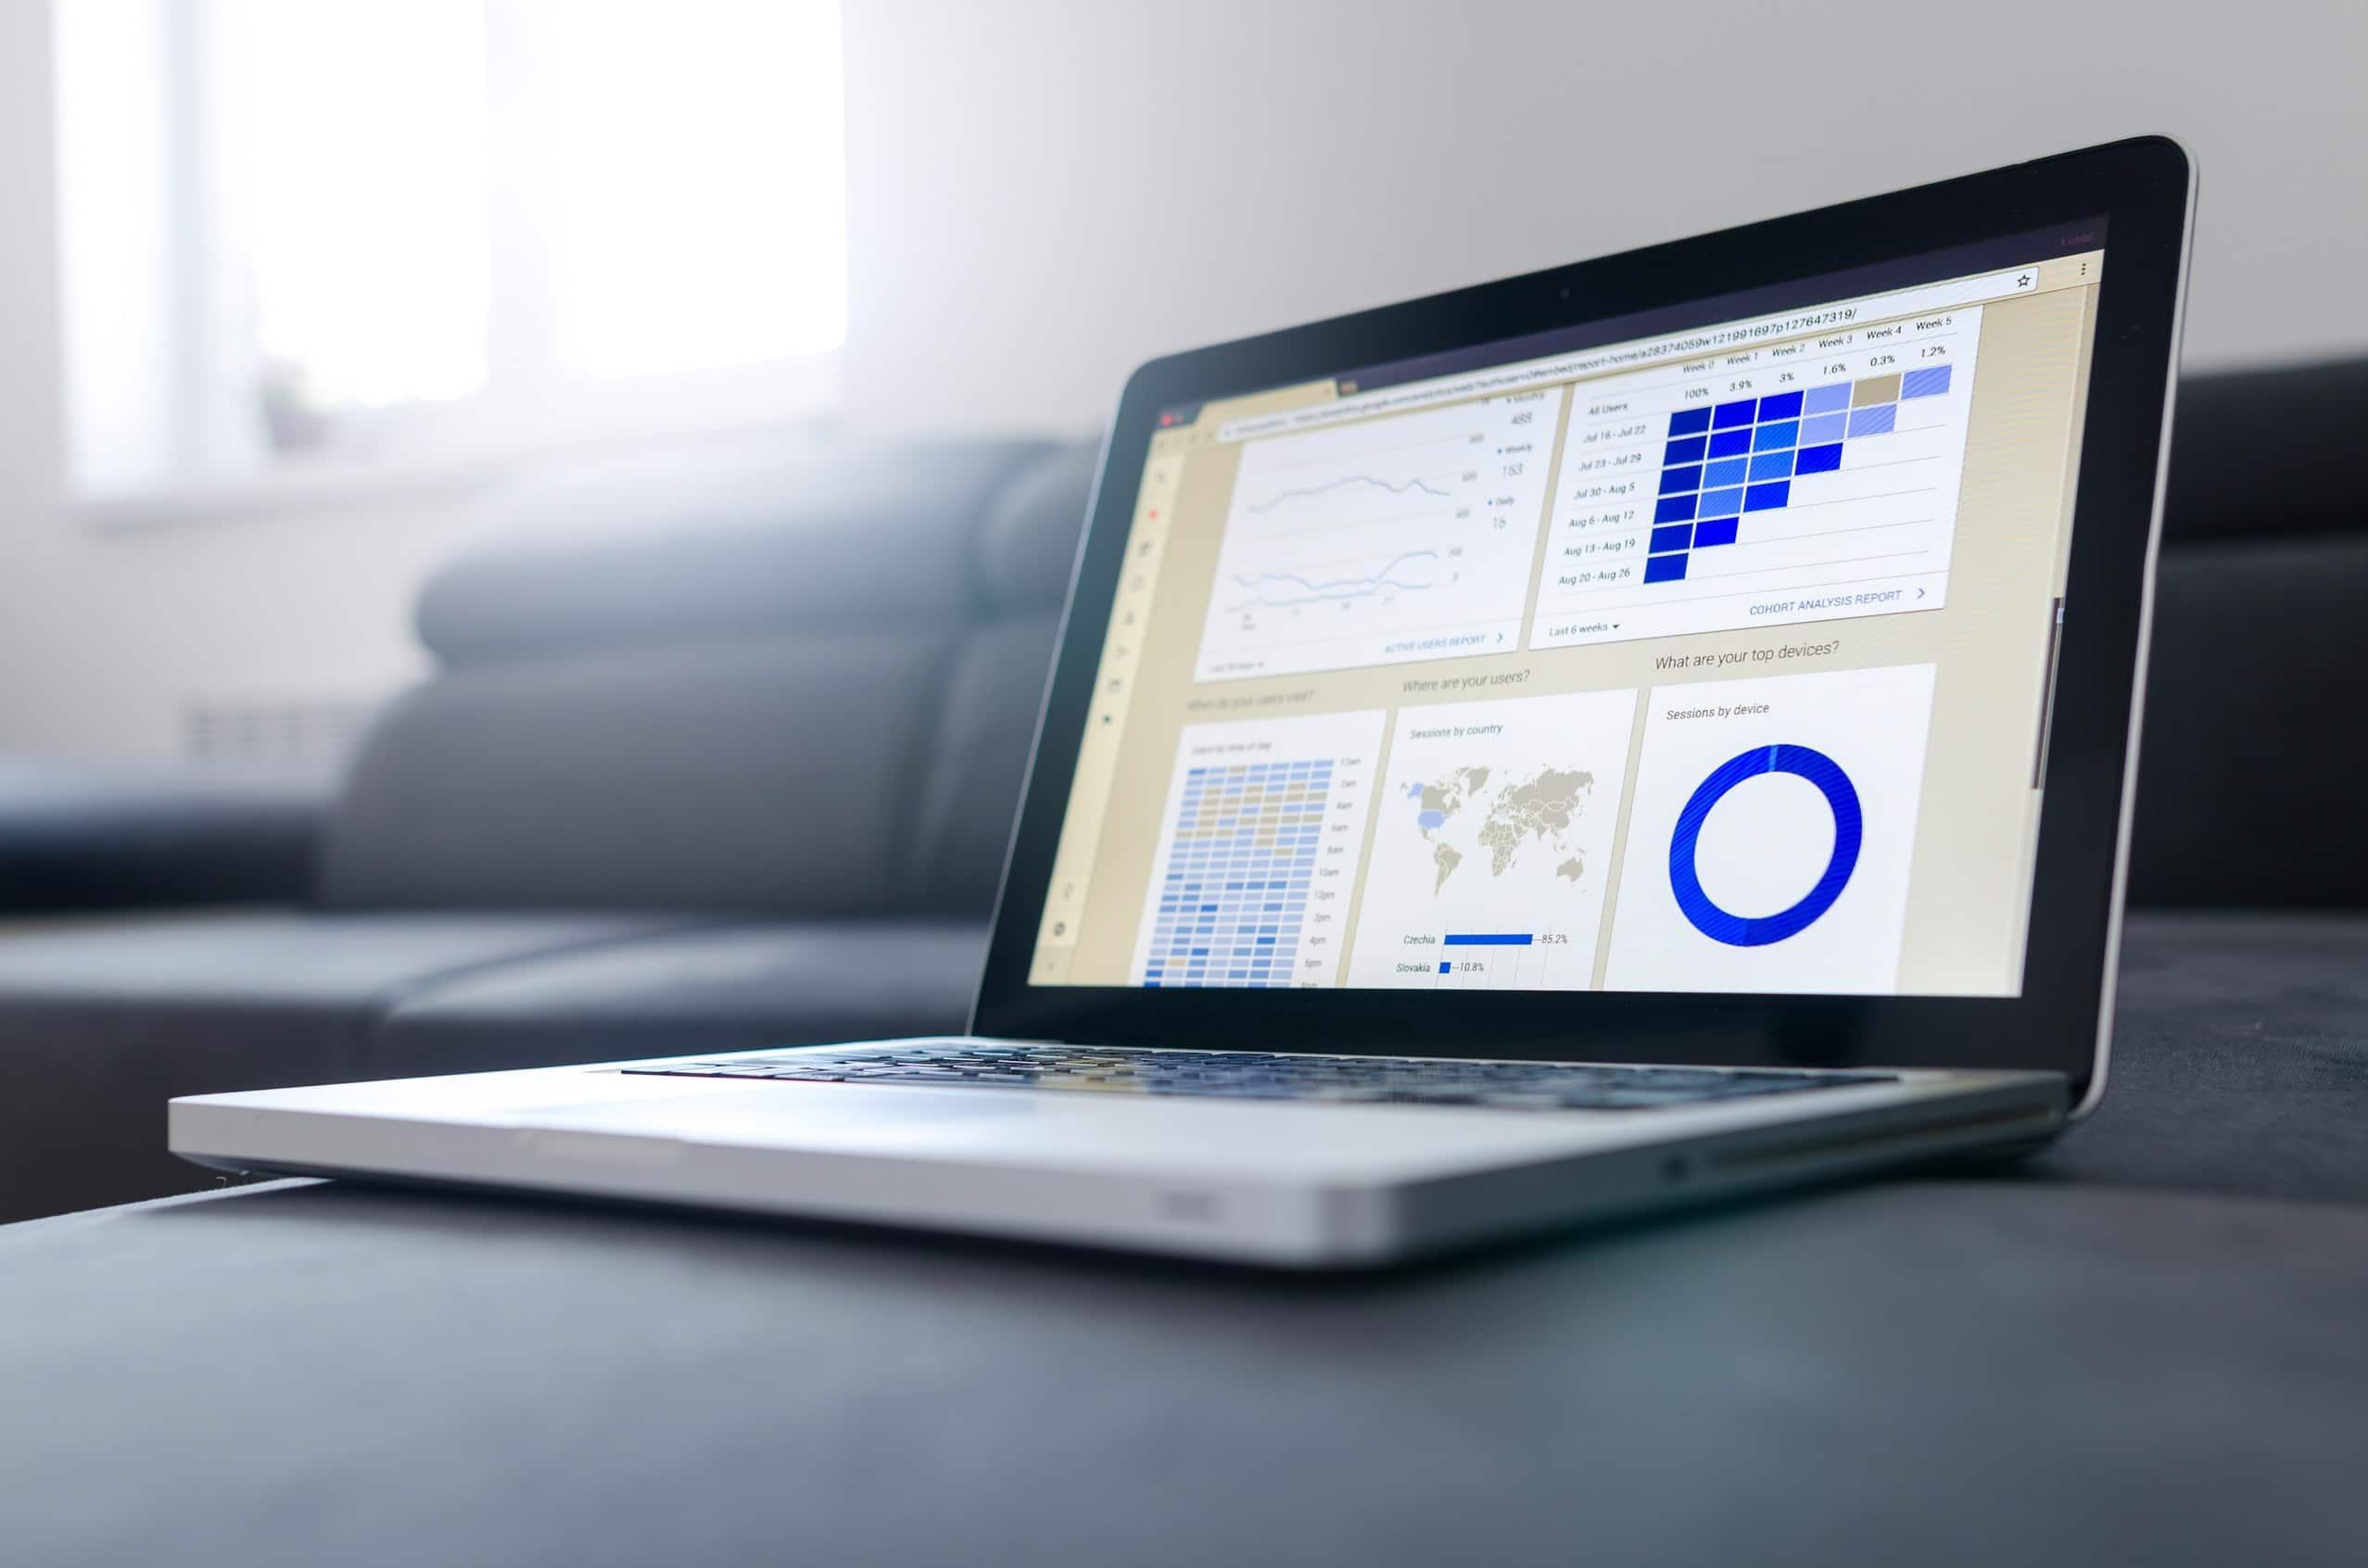 Laptop with screen full of data on amazon associates.com